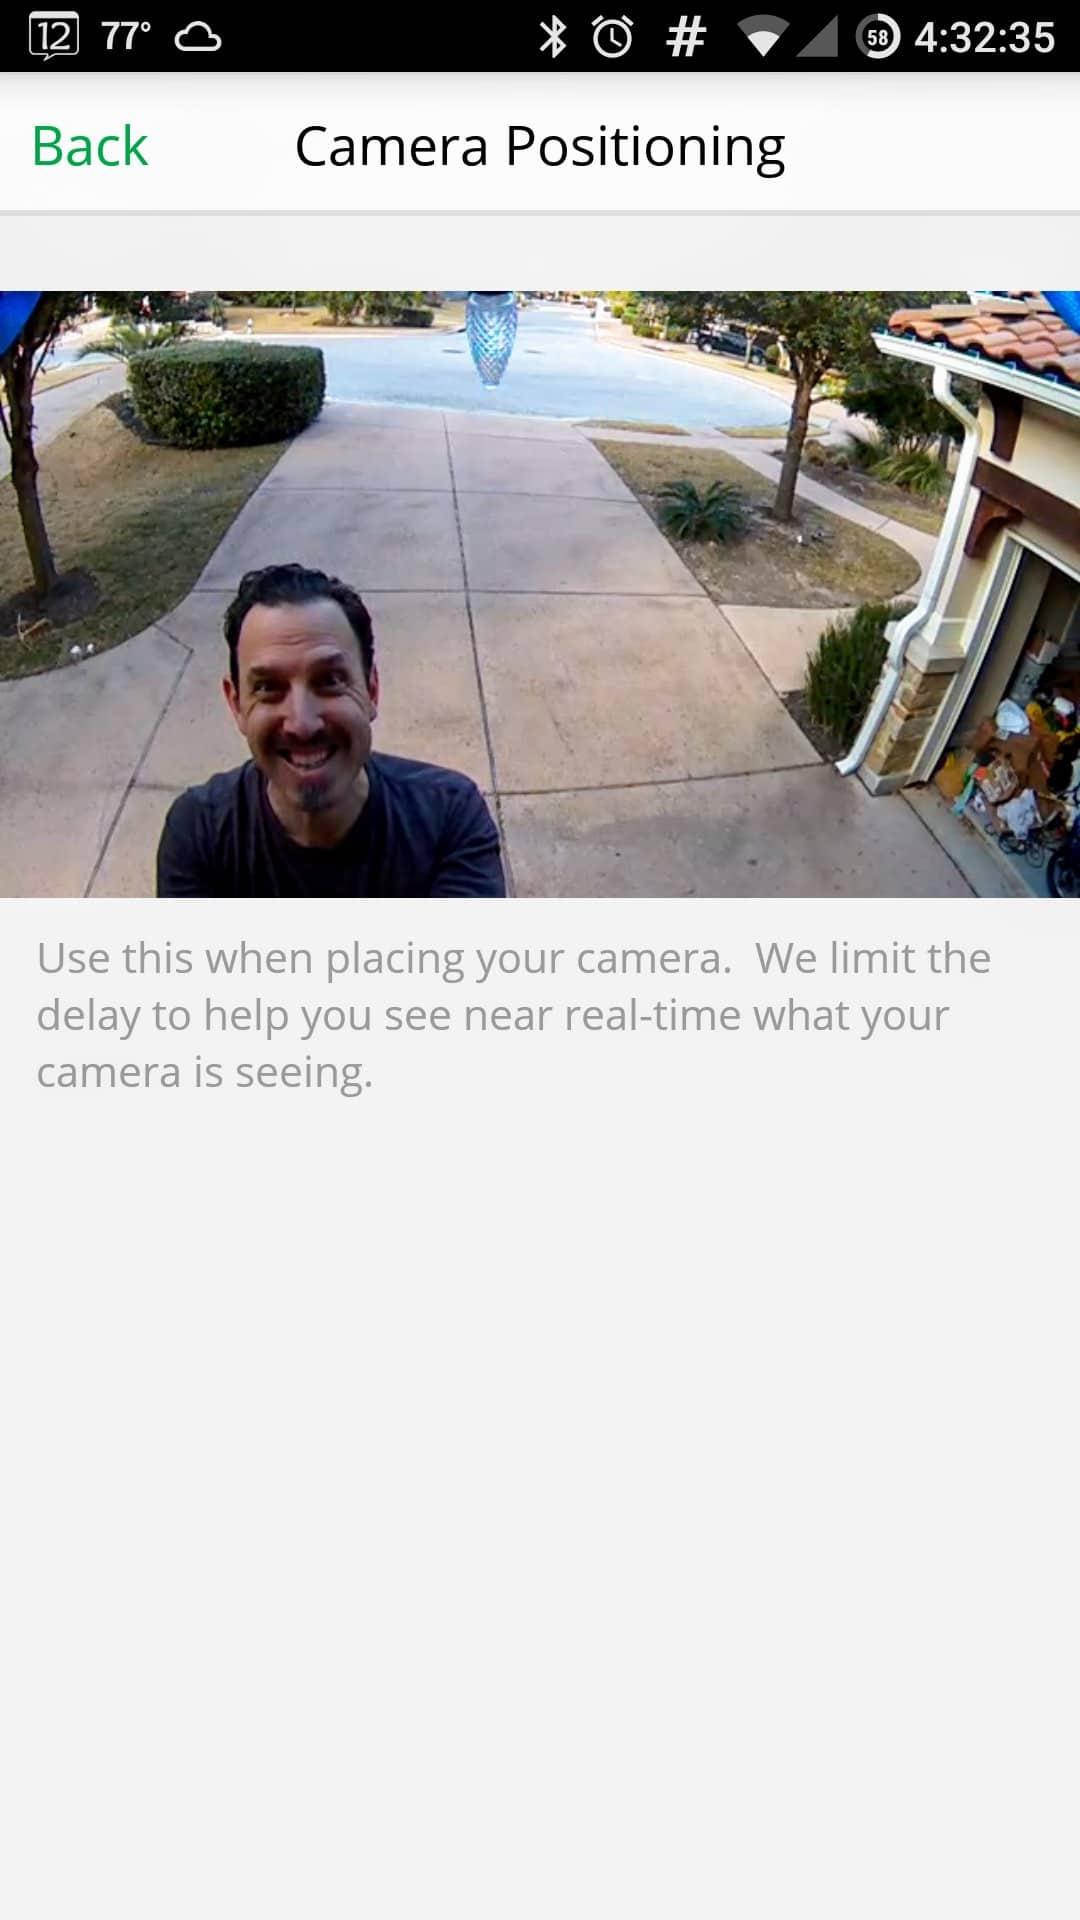 Netgear Arlo Pro Wireless Security Camera System Review ...